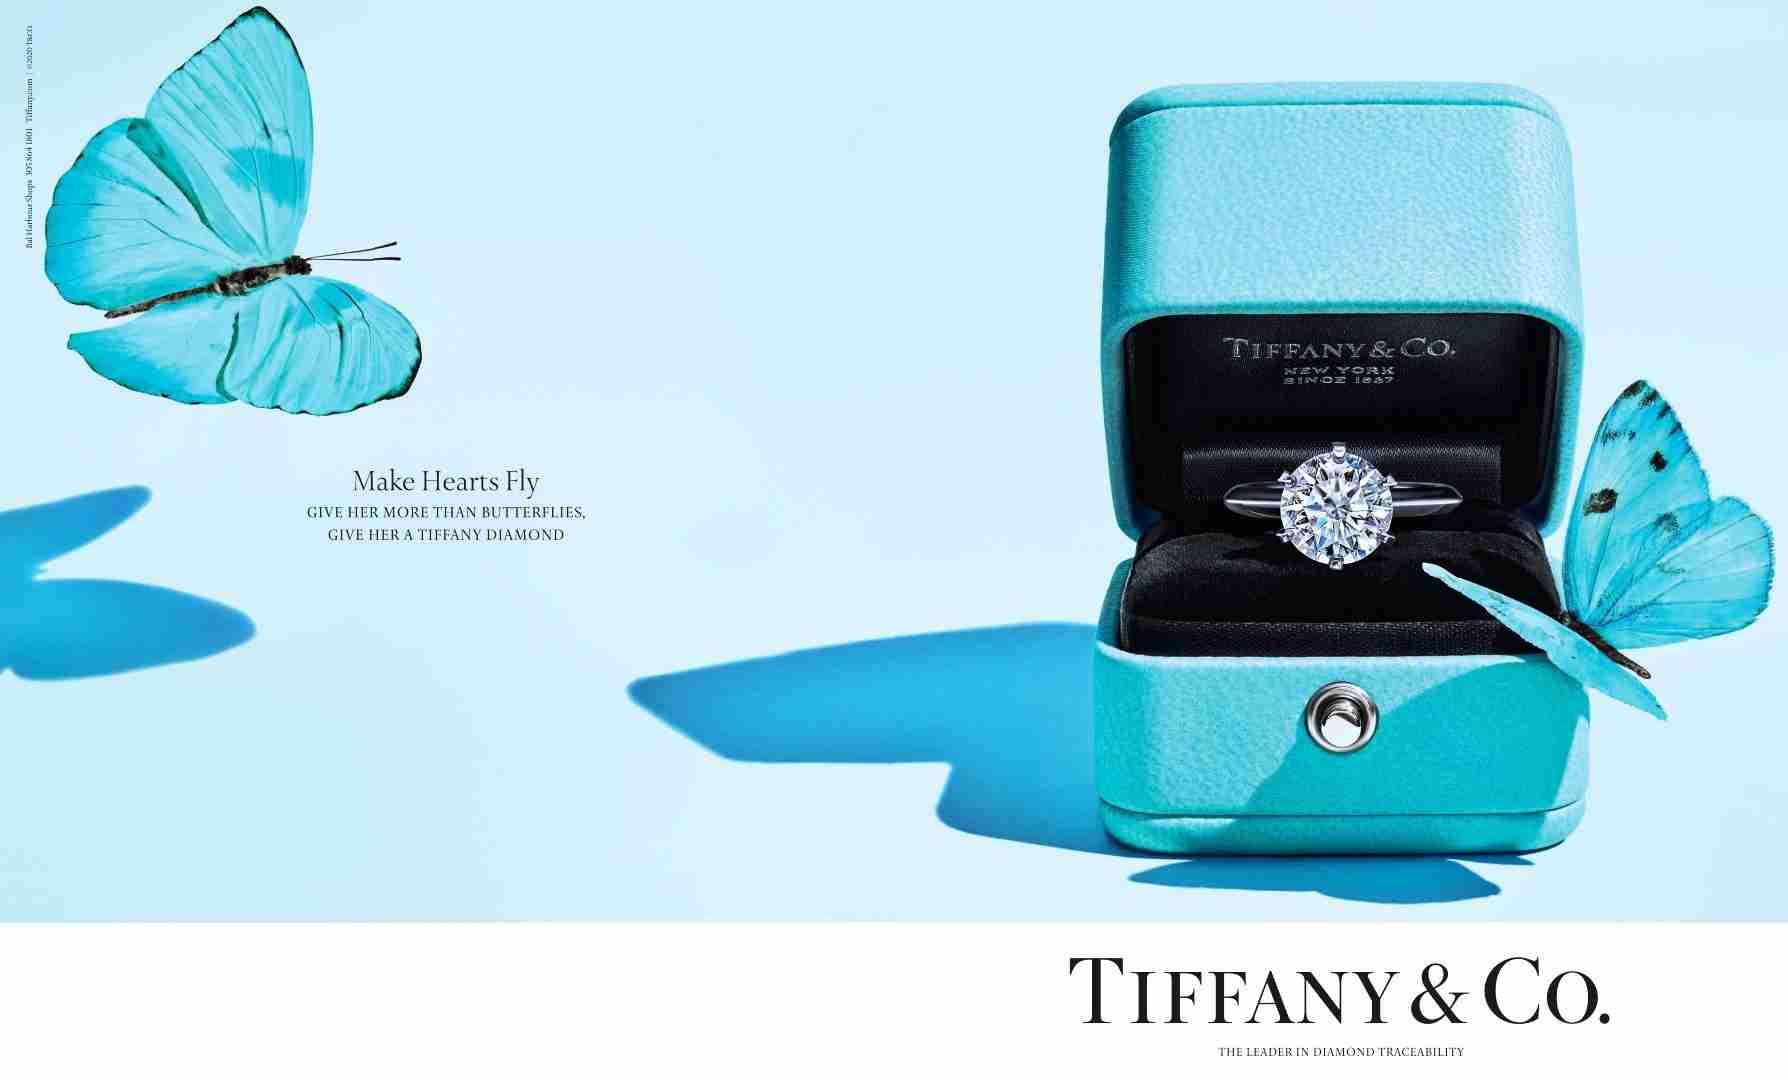 Tiffany & Co Solitaire